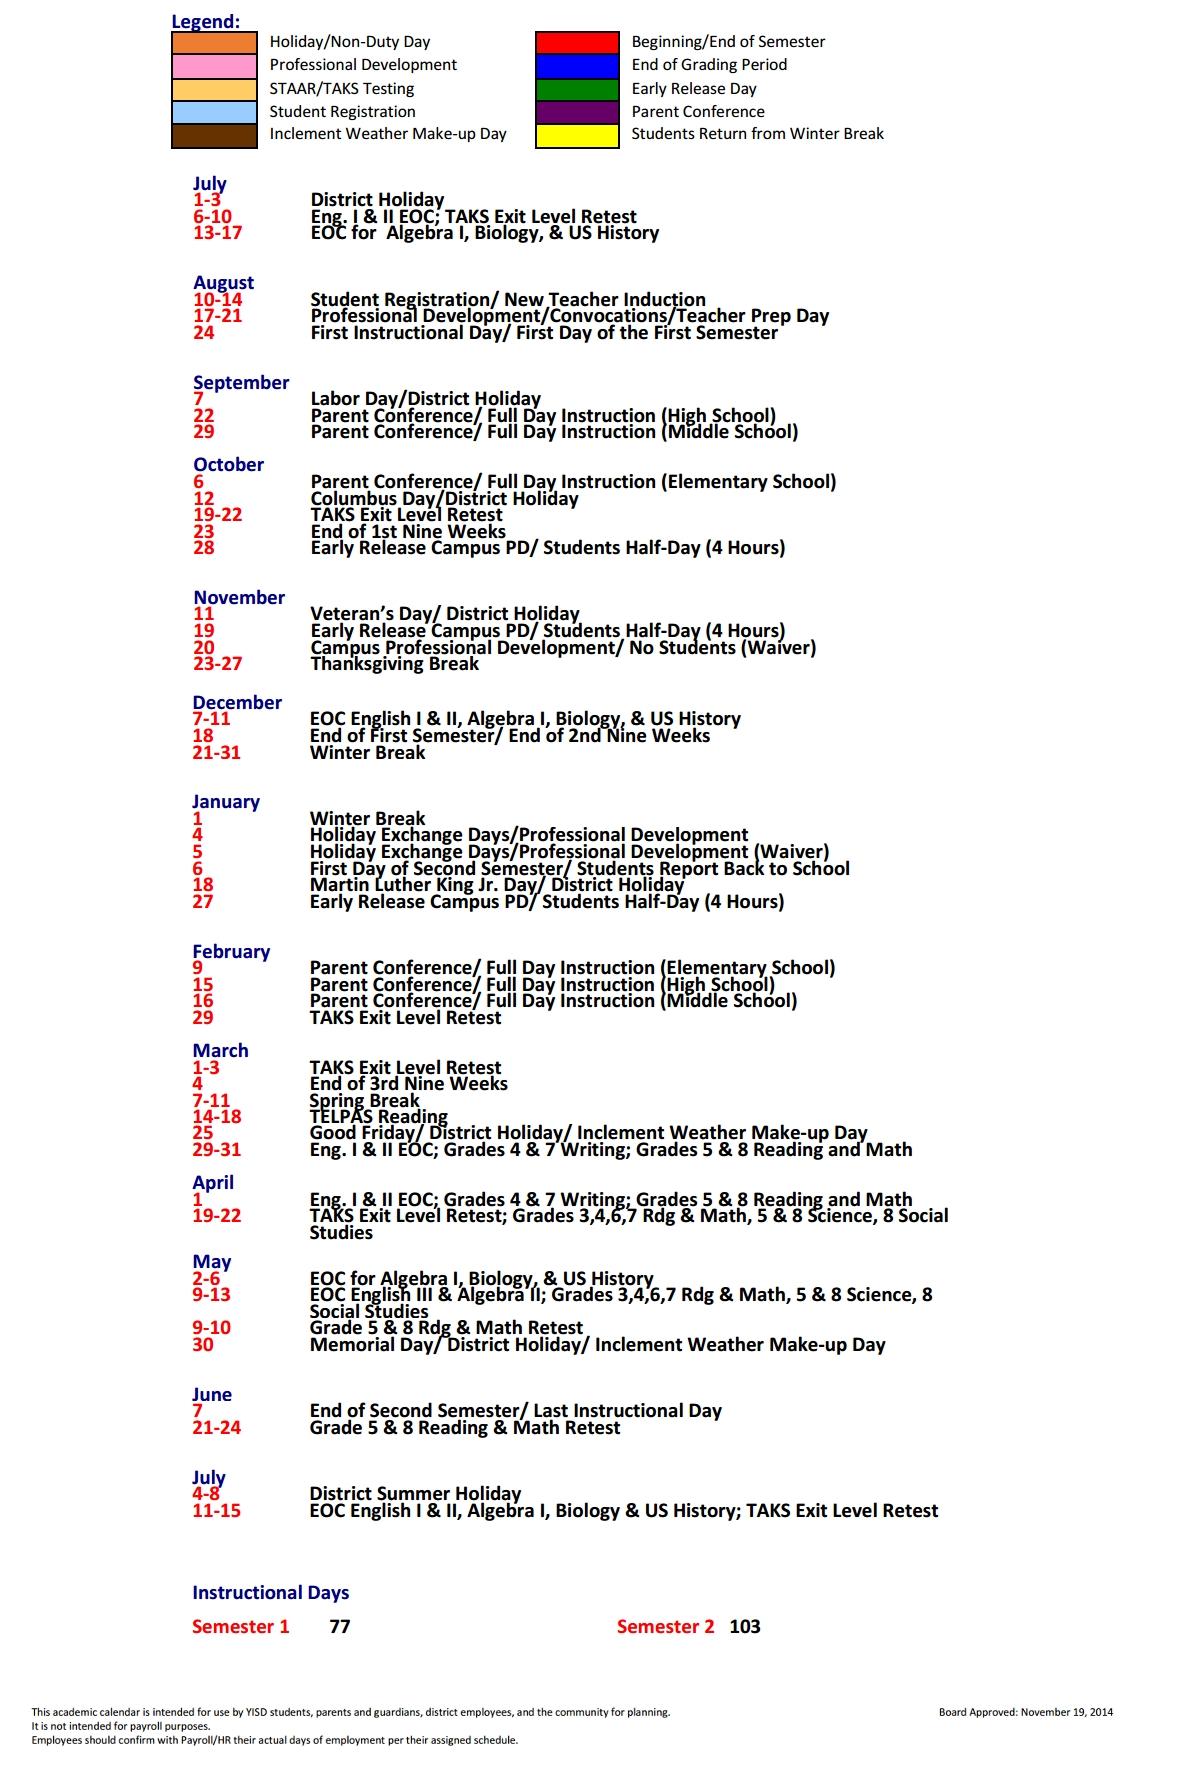 J M Hanks High School School District Instructional Calendar